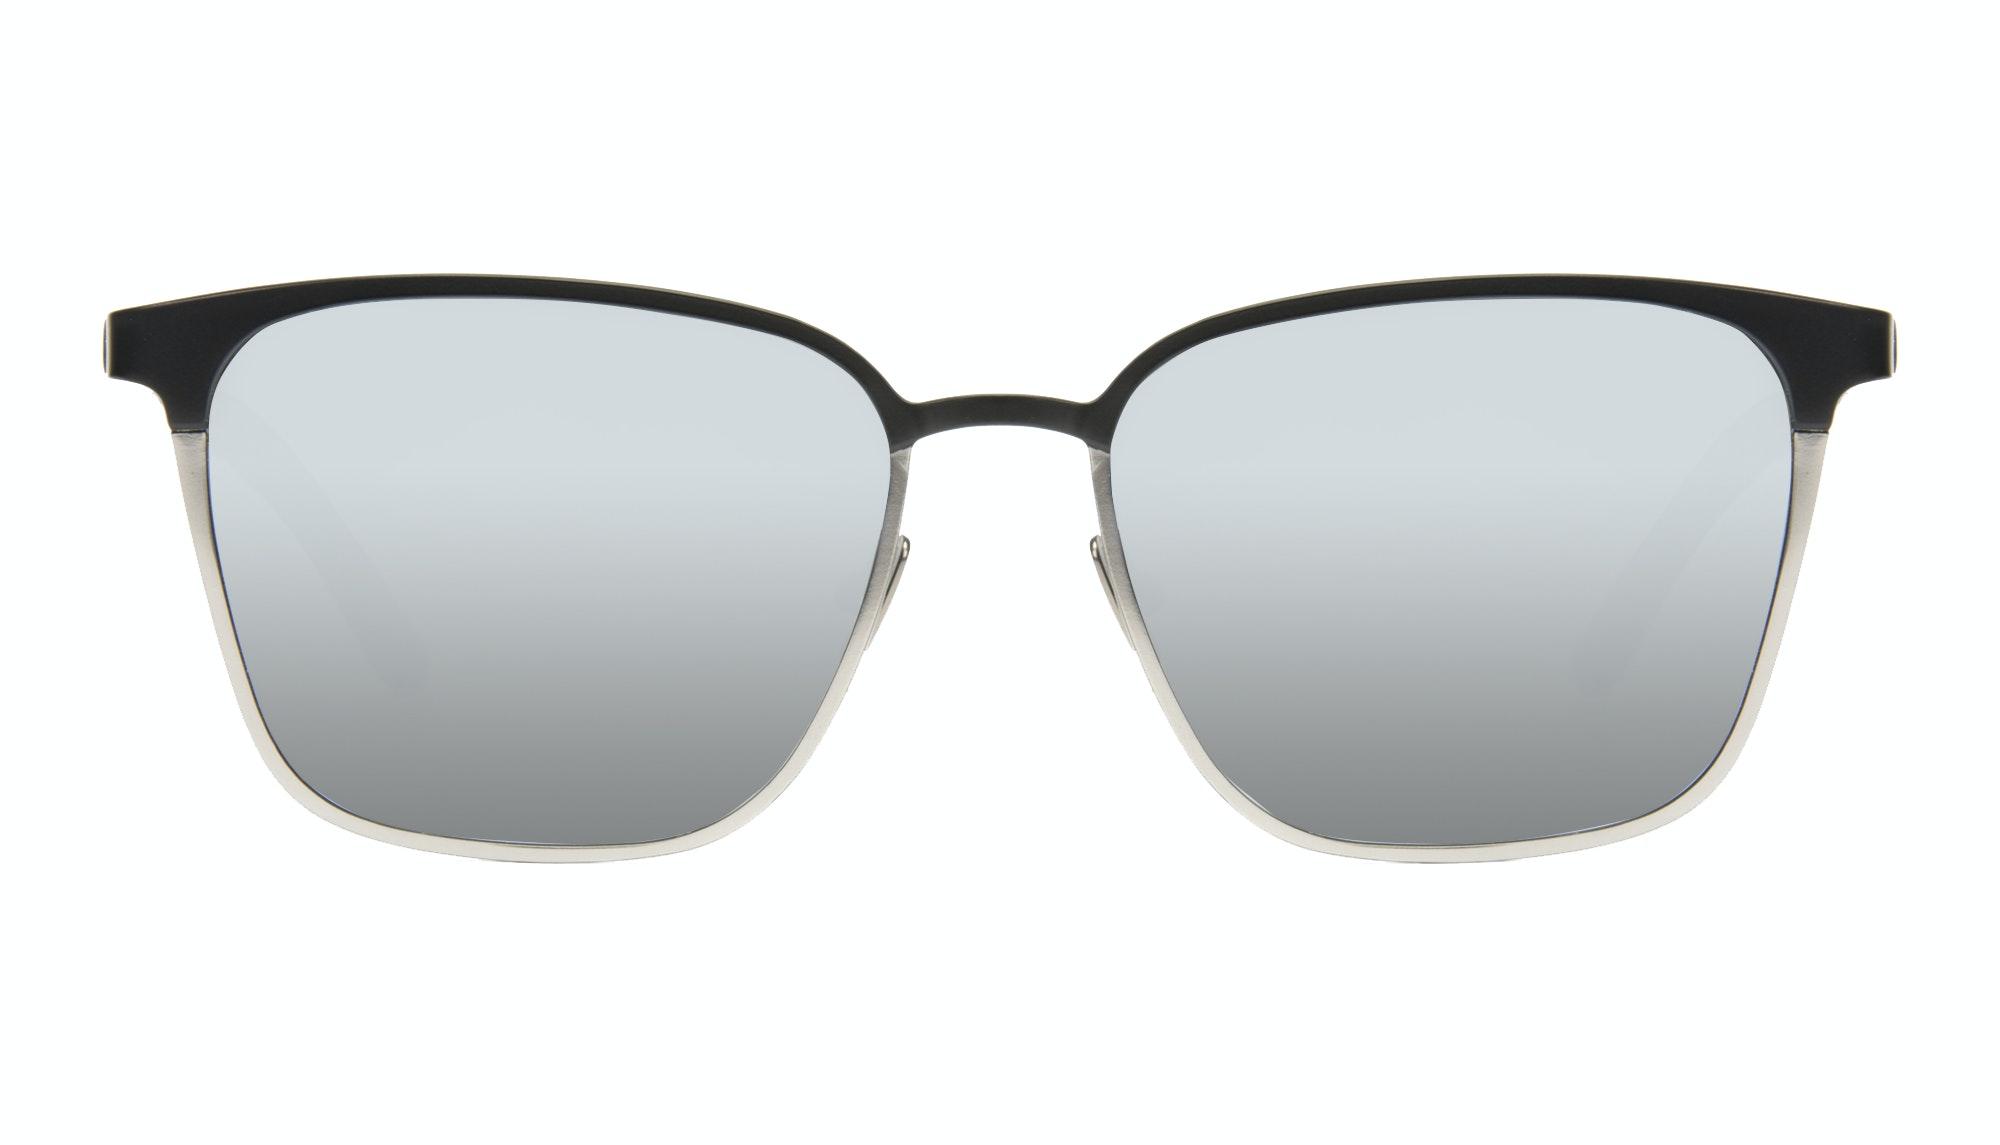 Affordable Fashion Glasses Rectangle Sunglasses Men Rove Deep Silver